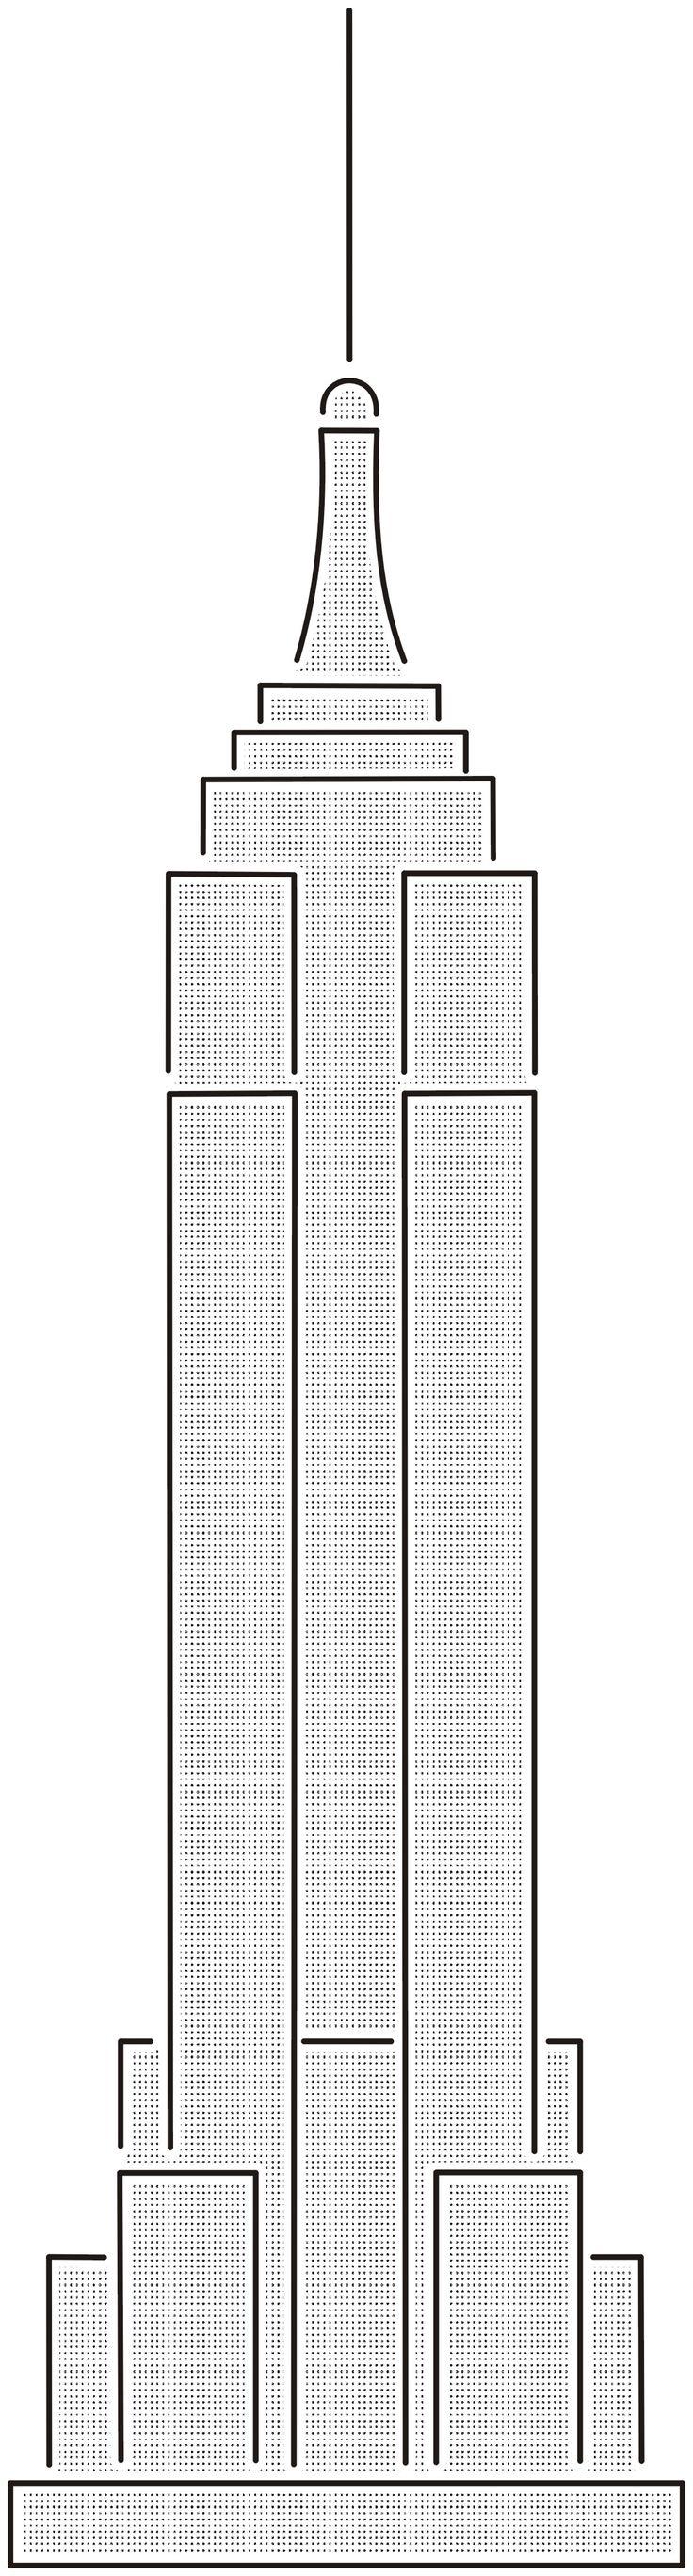 Empire state building floor plan